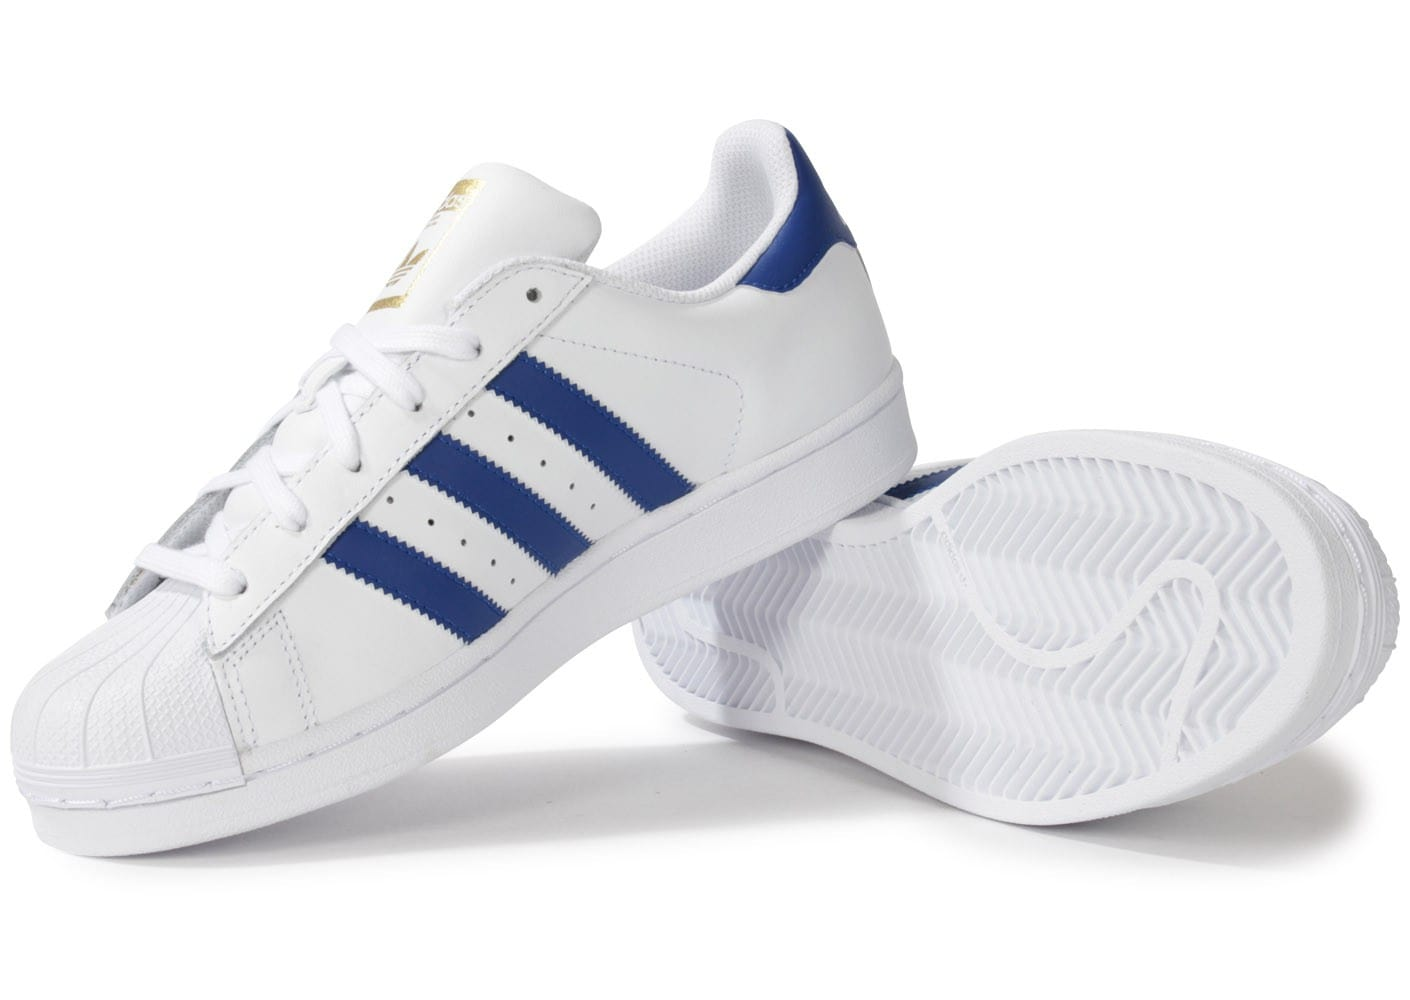 code promo 3f294 4c29c Adidas Superstar Adidas Superstar Bleu Blanc Homme 3jqAc4RL5S